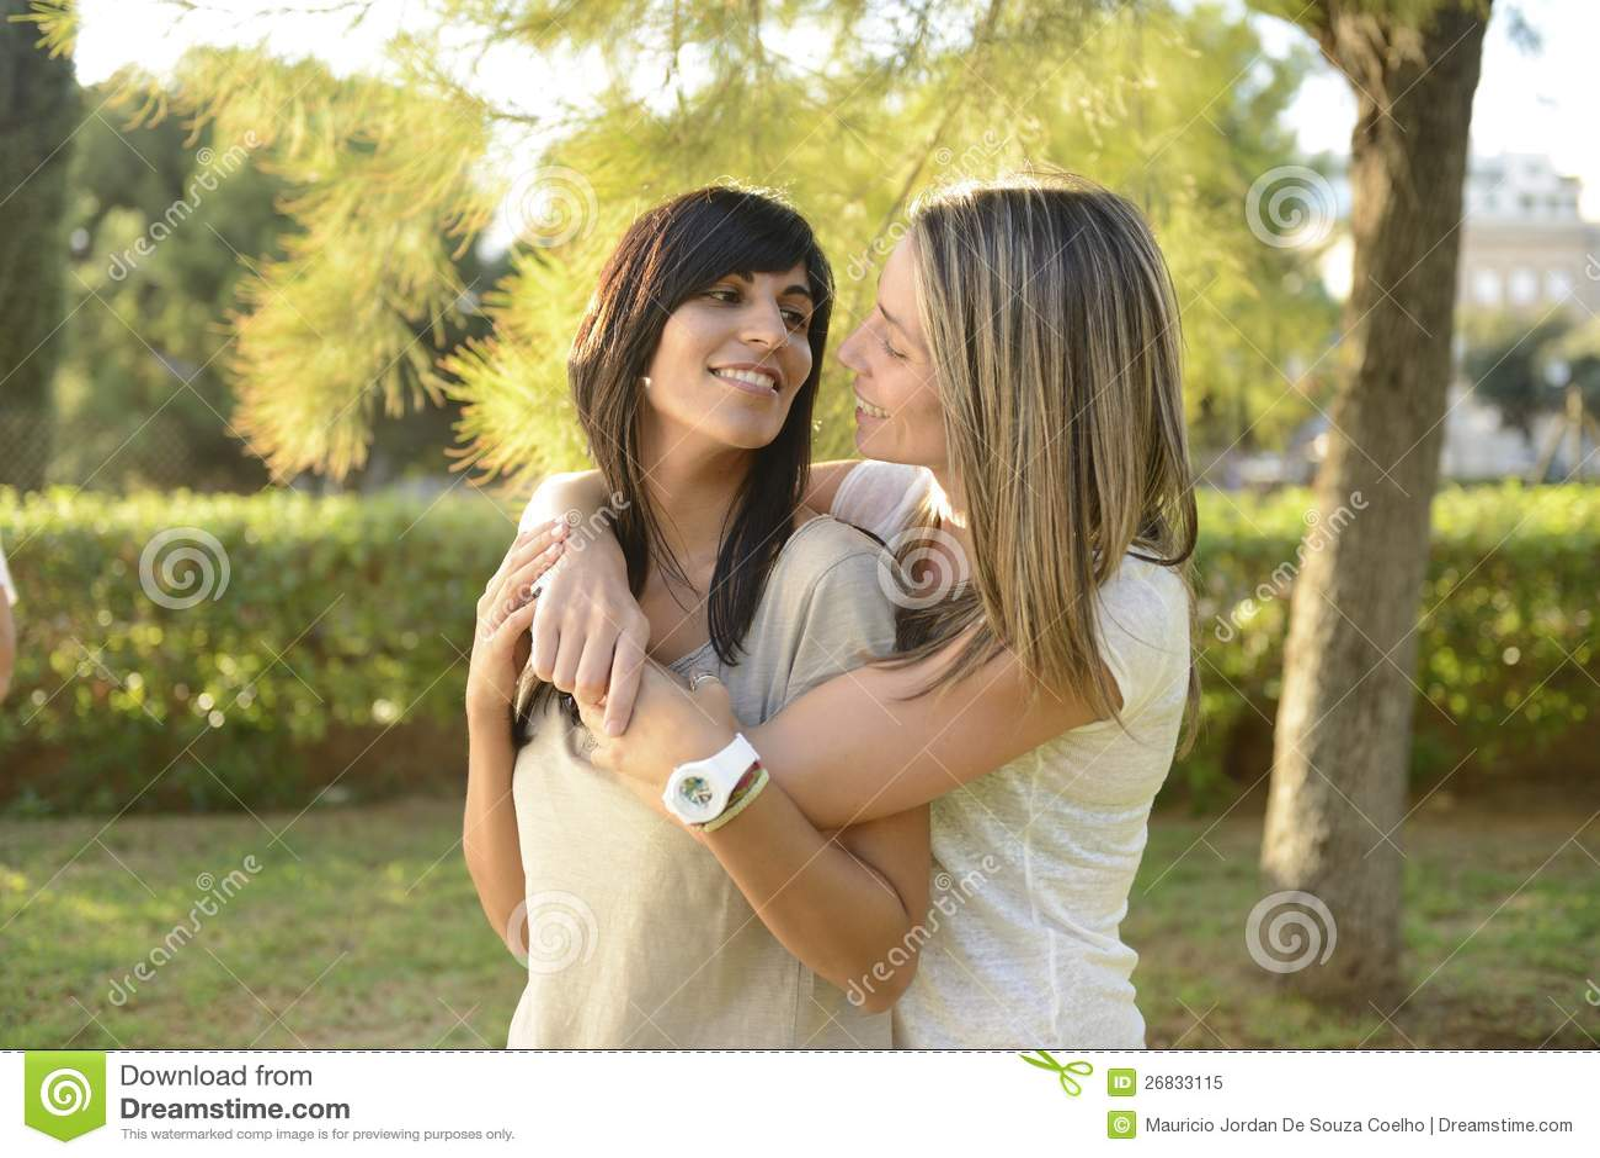 znamenitie-lesbi-pari